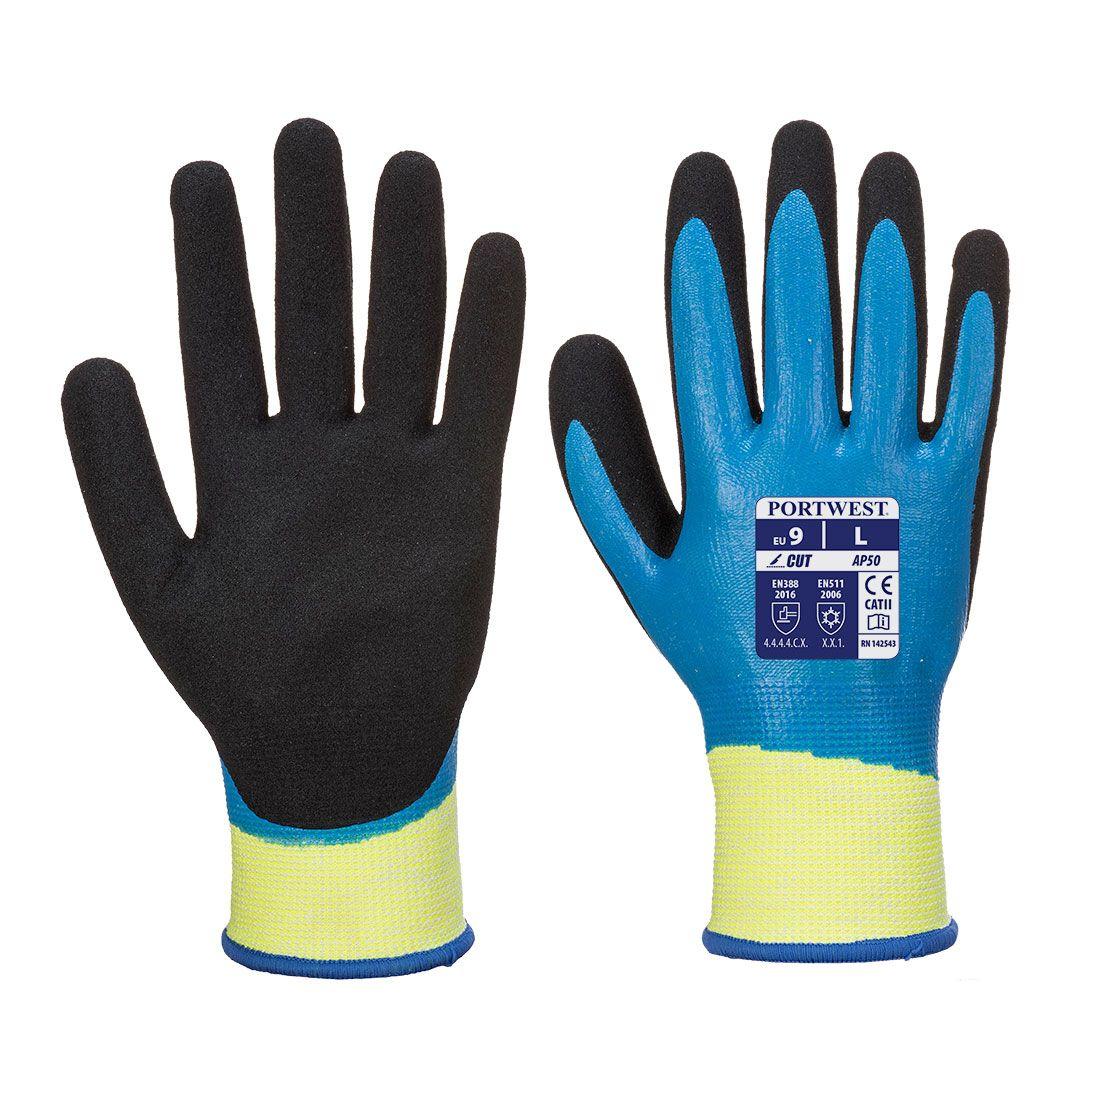 Portwest Handschoenen AP50 blauw-zwart(B8)